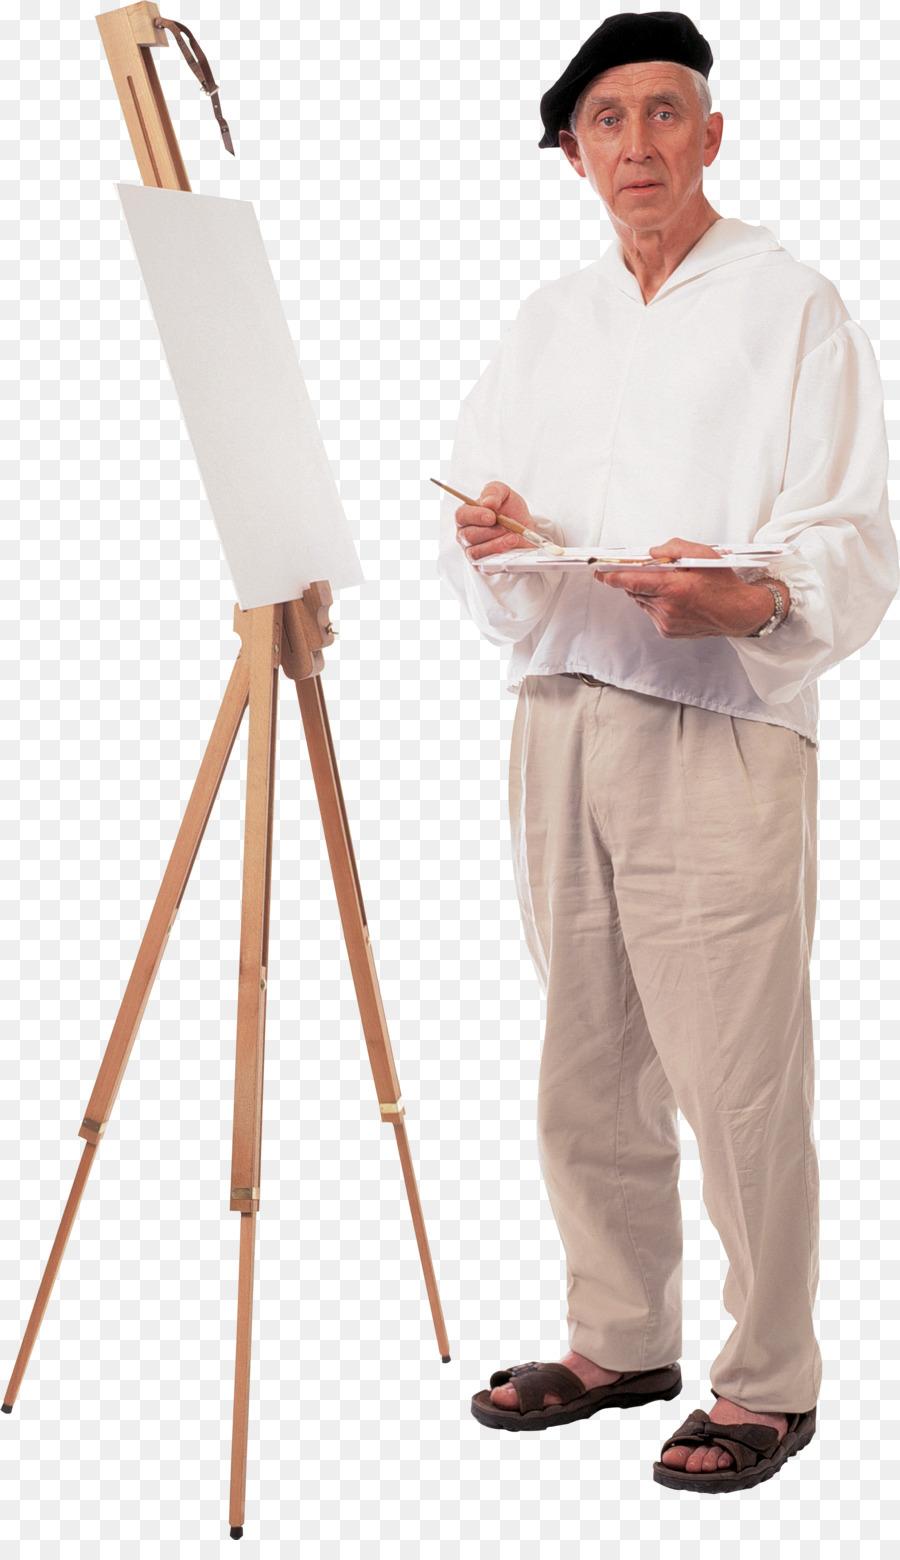 поменьше художница картинка на белом фоне пишут сми